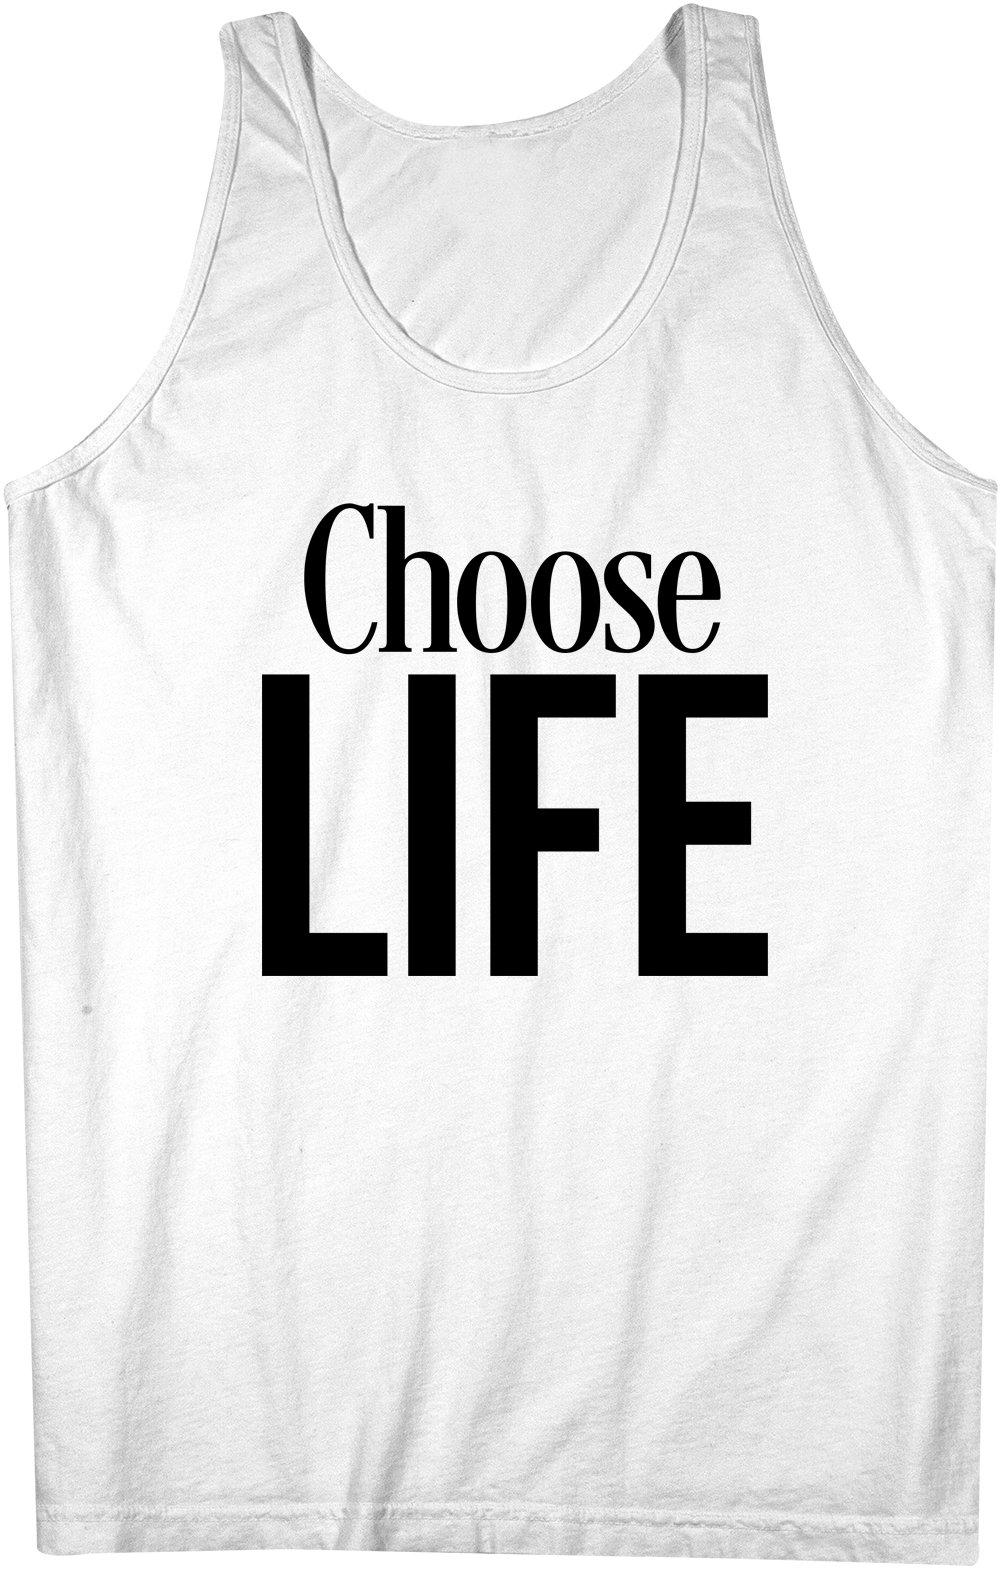 Choose Life Tank Top Sleeveless Shirt X 9106